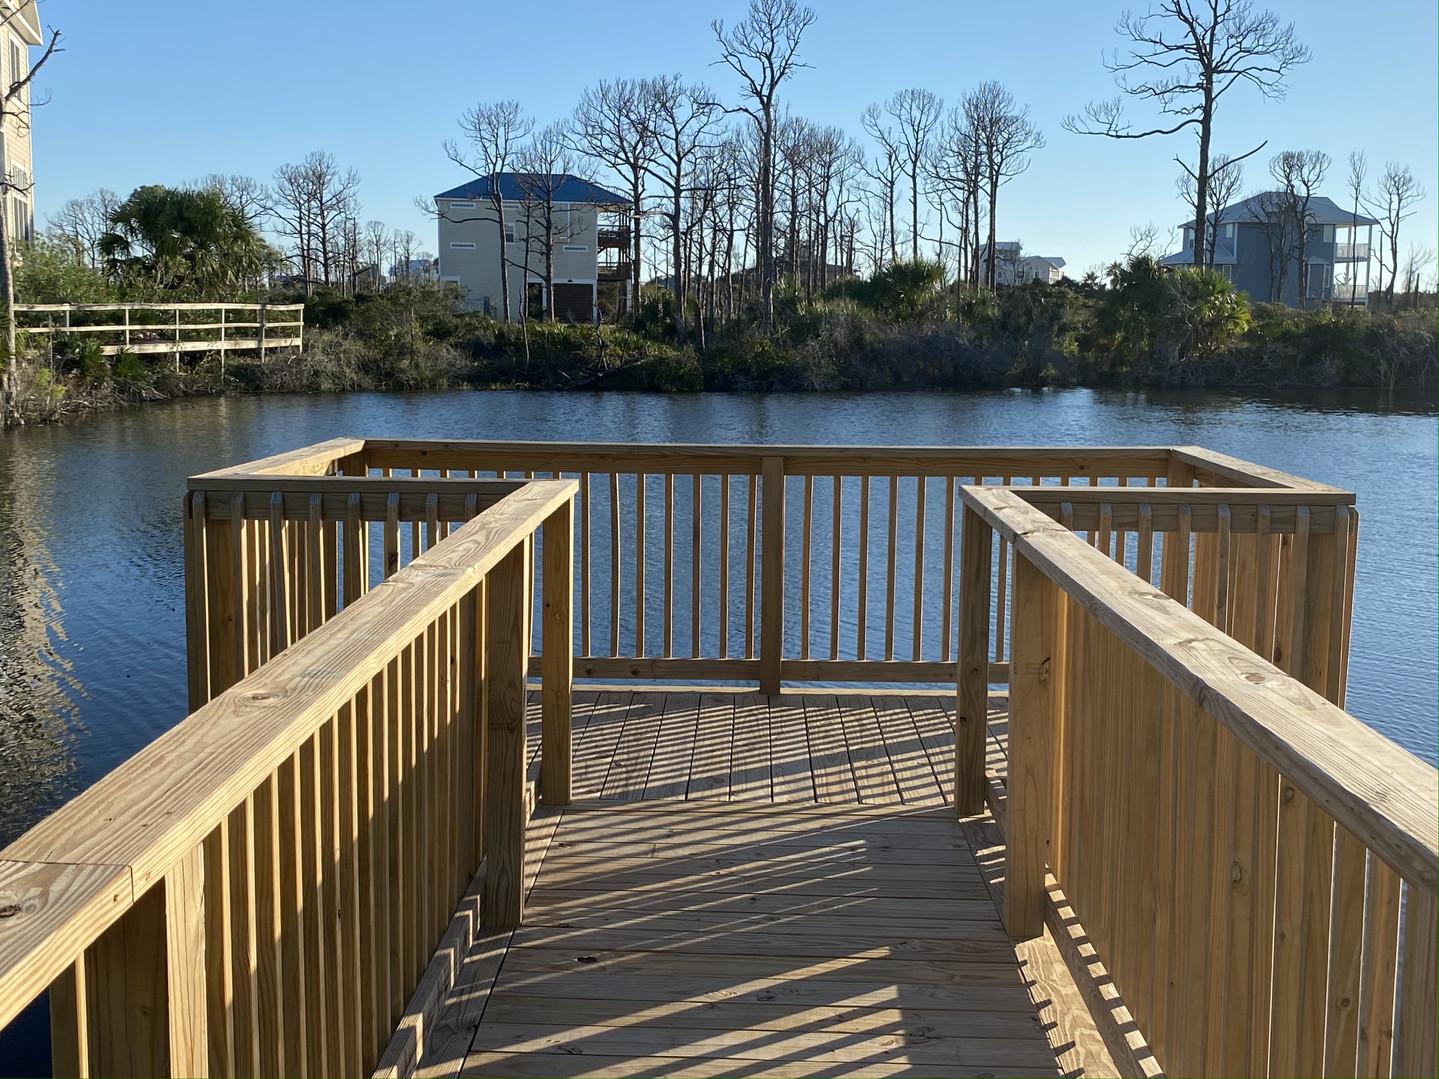 Boardwalk for fishing pond